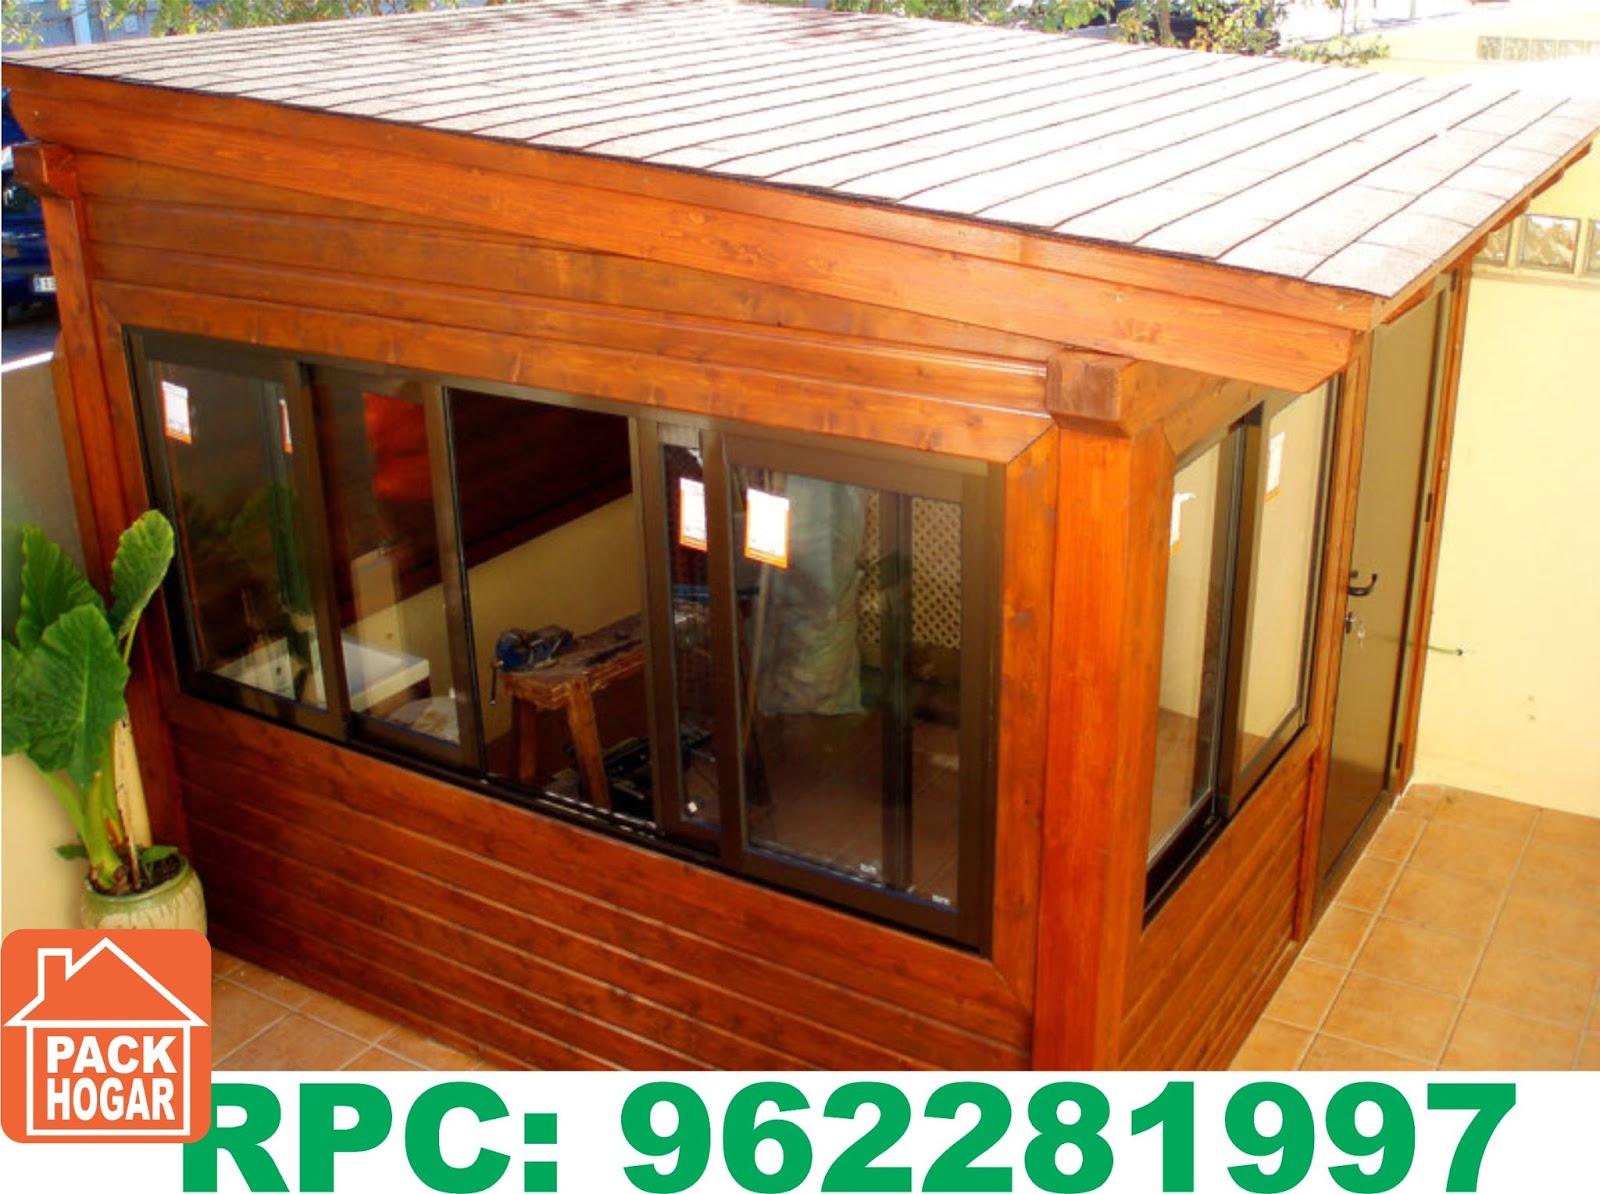 Casetas cuartos prefabricadas para azoteas packhogar - Habitacion de madera ...